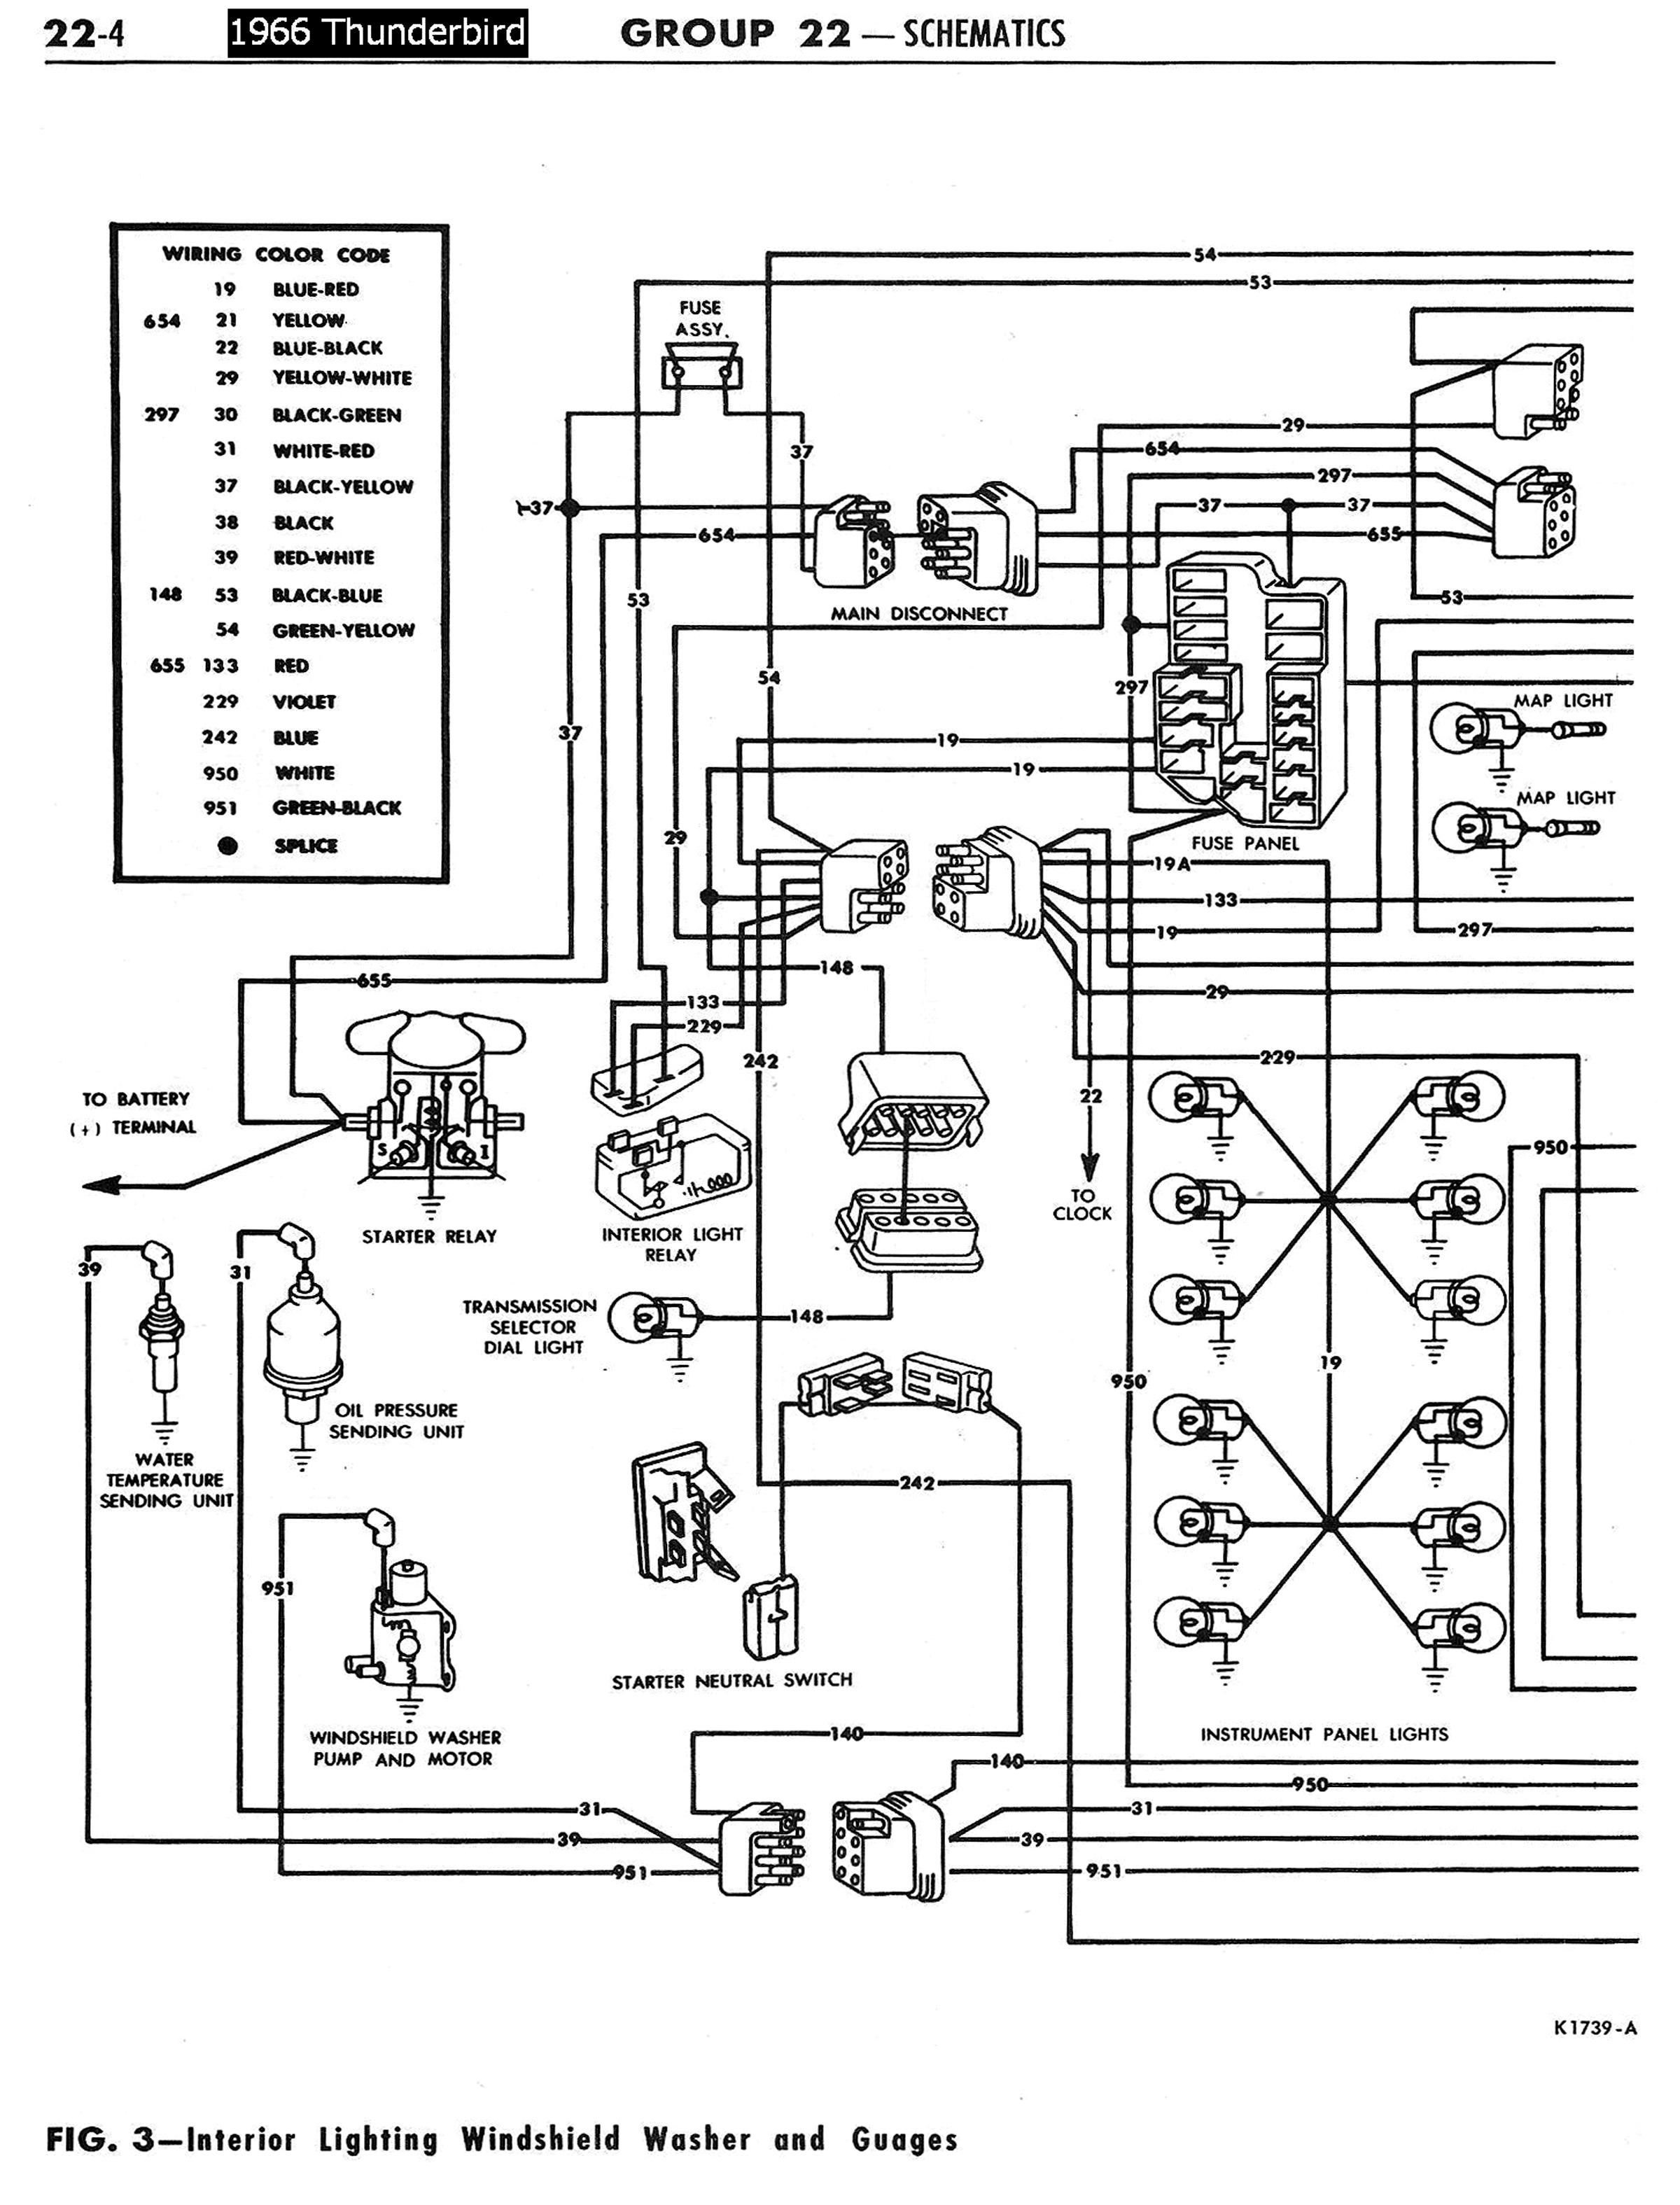 Alternator Wiring Diagram 66 Mustang 66 Mustang